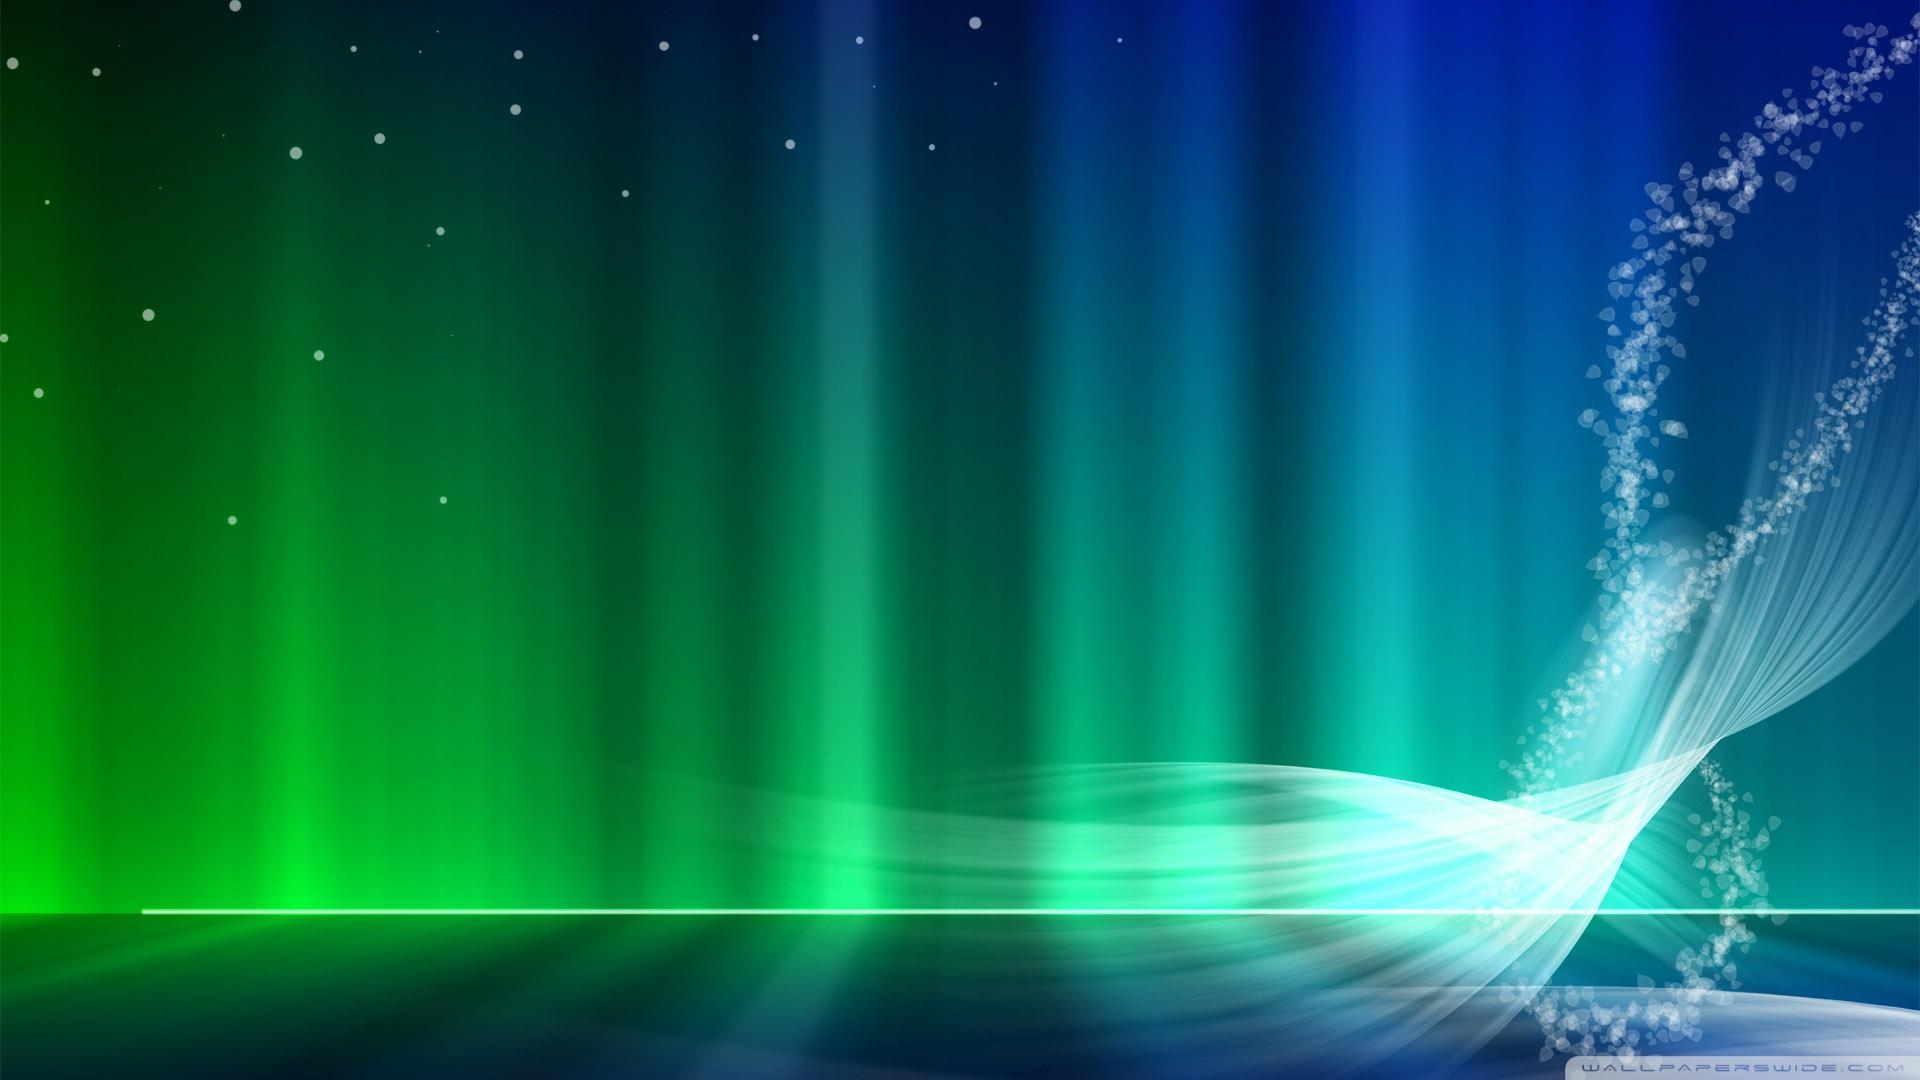 Vista Blue And Green Aurora 4K HD Desktop Wallpaper for 4K 1920x1080